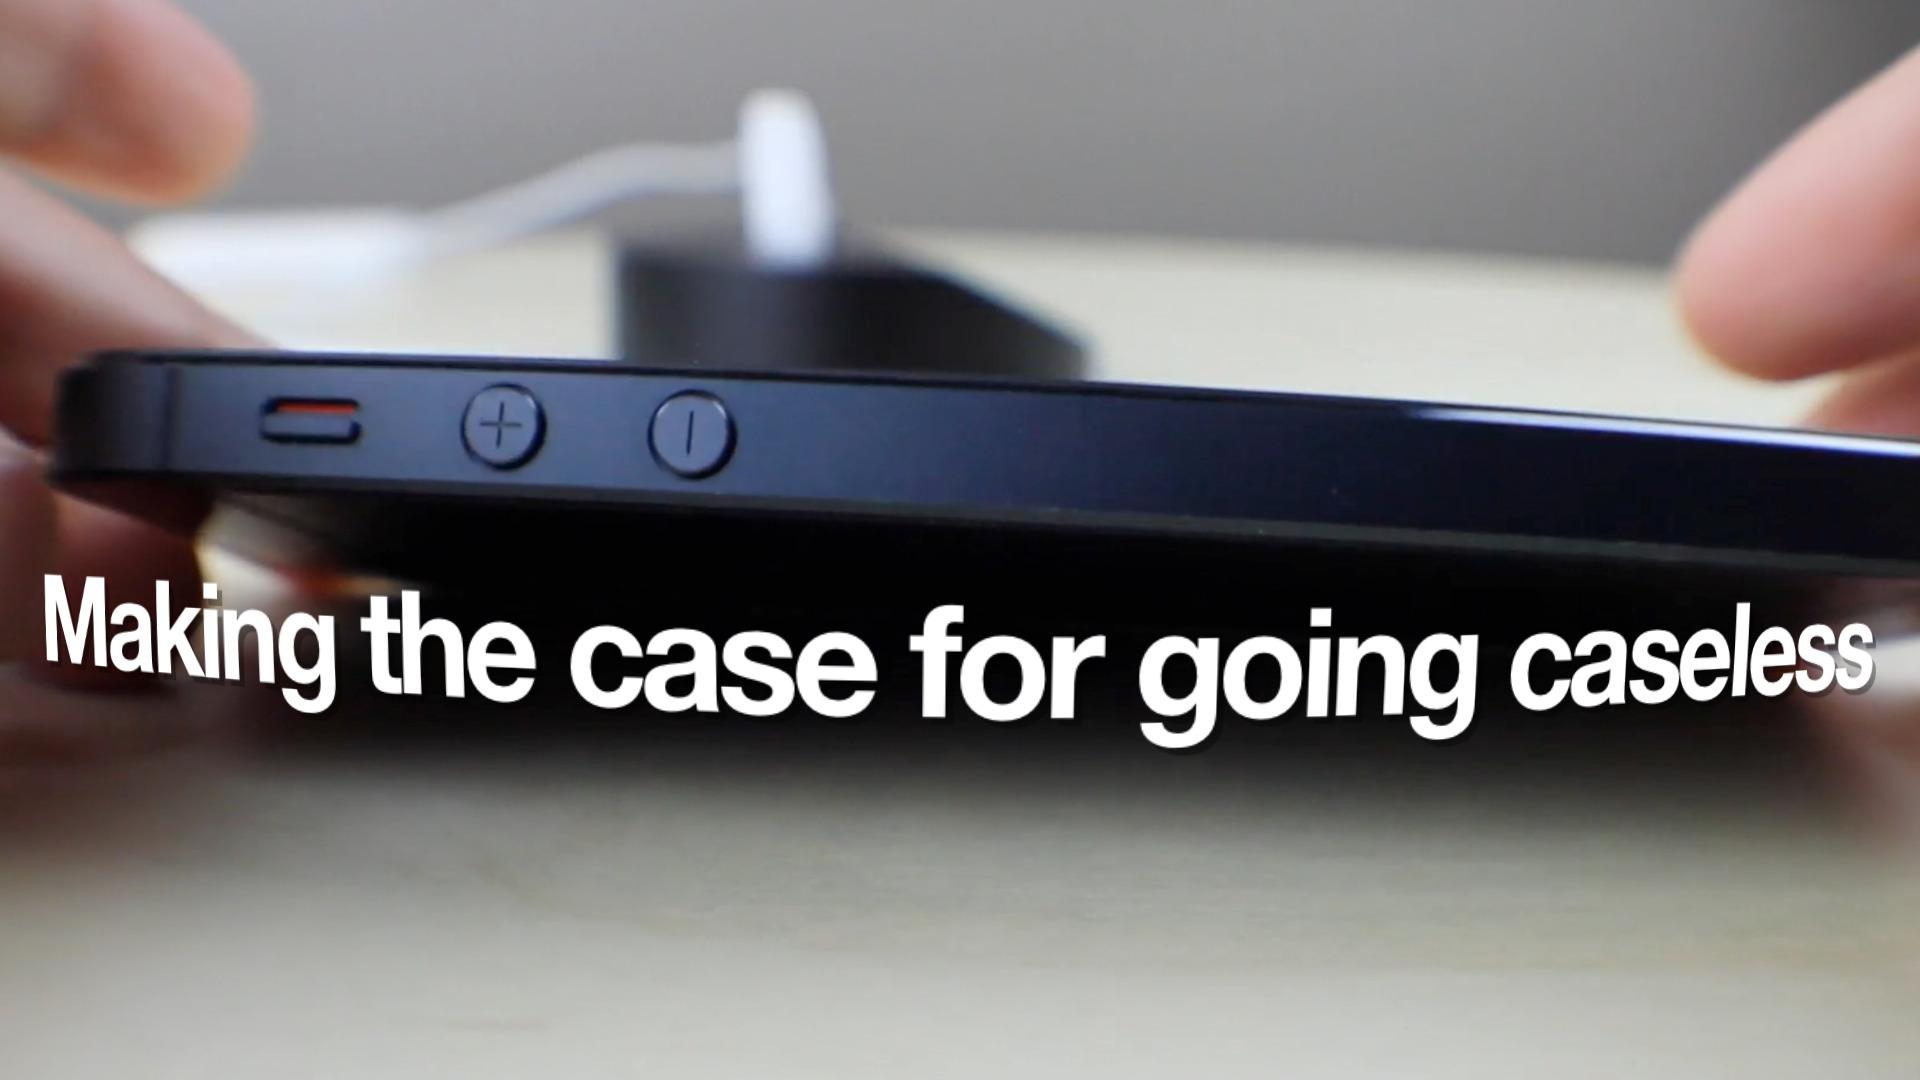 Caseless iPhone 5